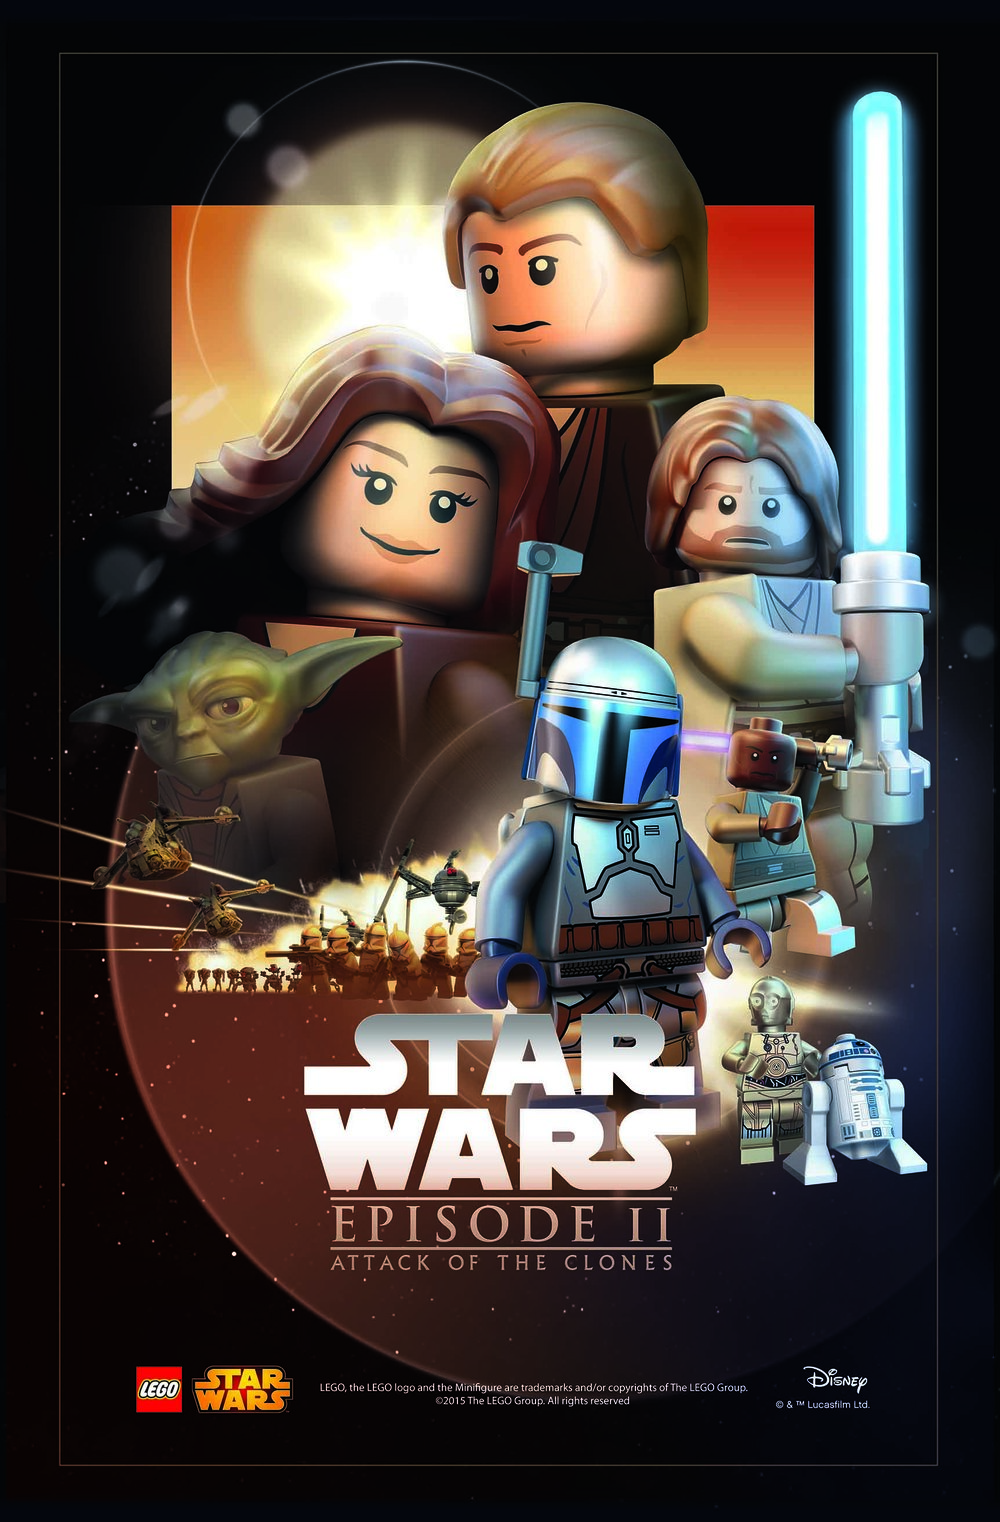 LEGO-Star-Was-Movie-Poster-Episode-2-v7.jpg